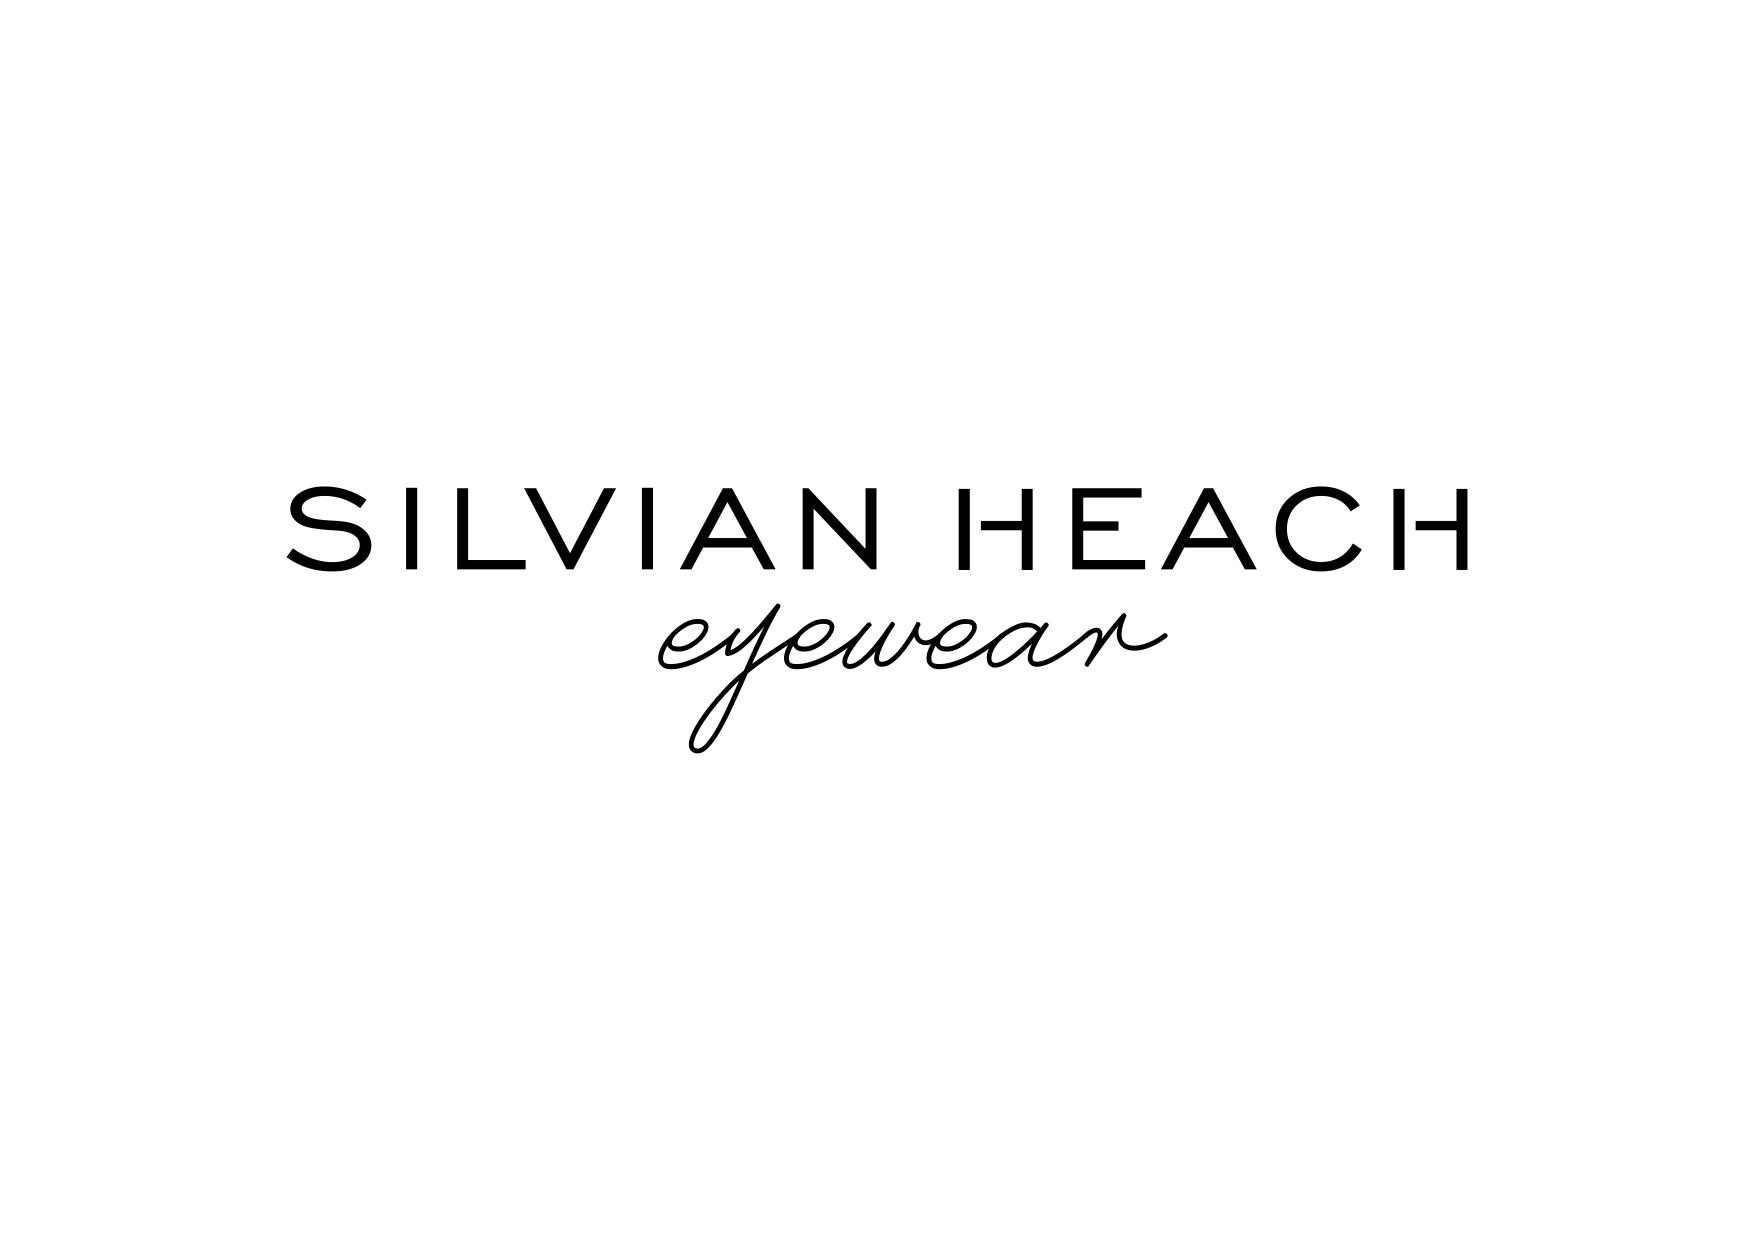 SILVIAN HEACH Eyewear logo